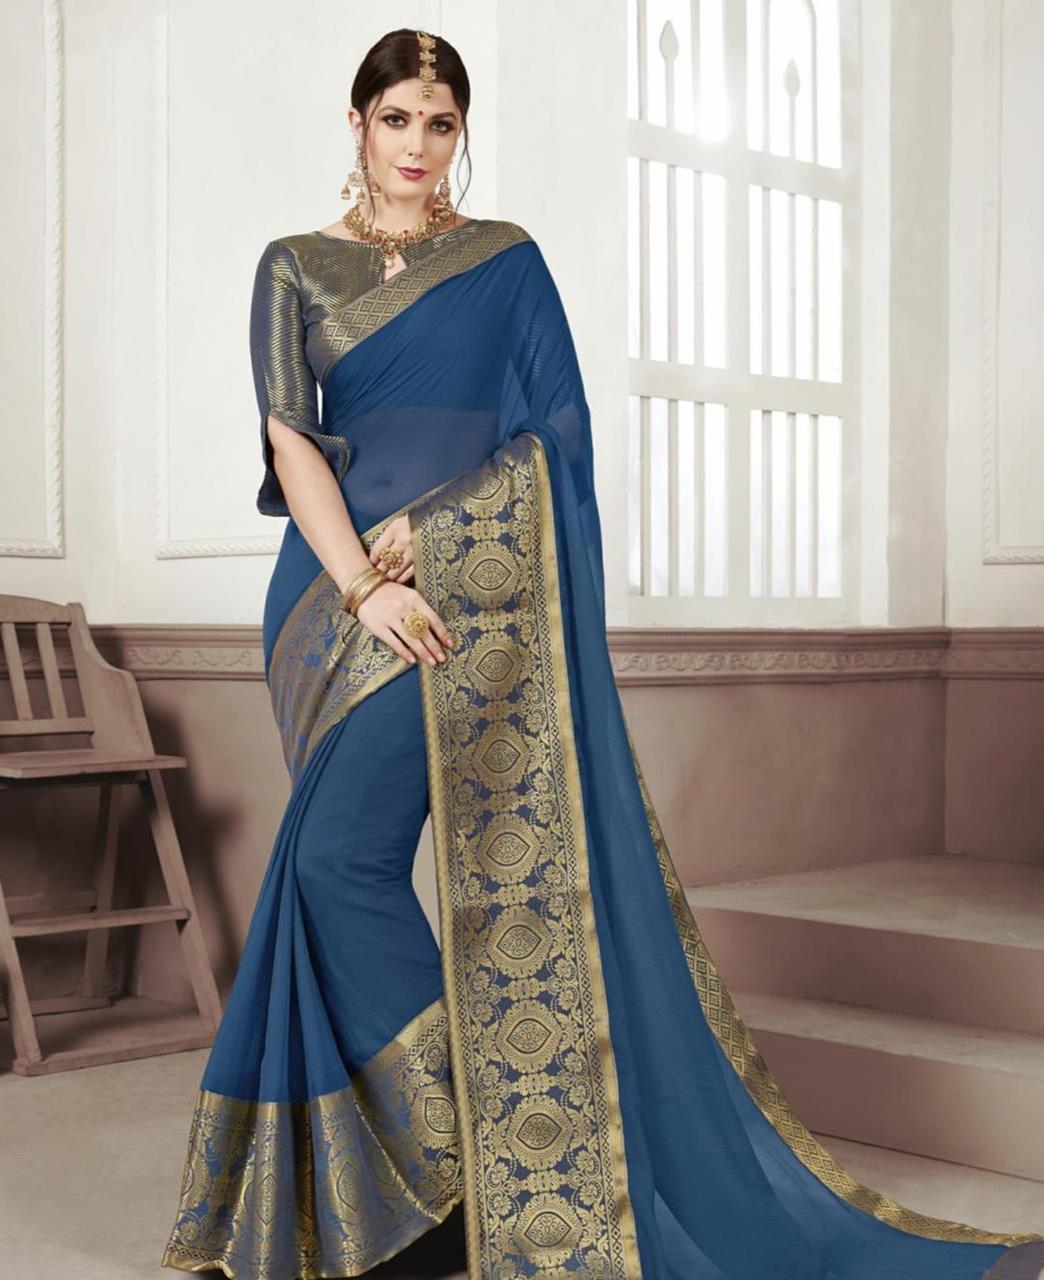 Woven Chiffon Saree (Sari) in Blue